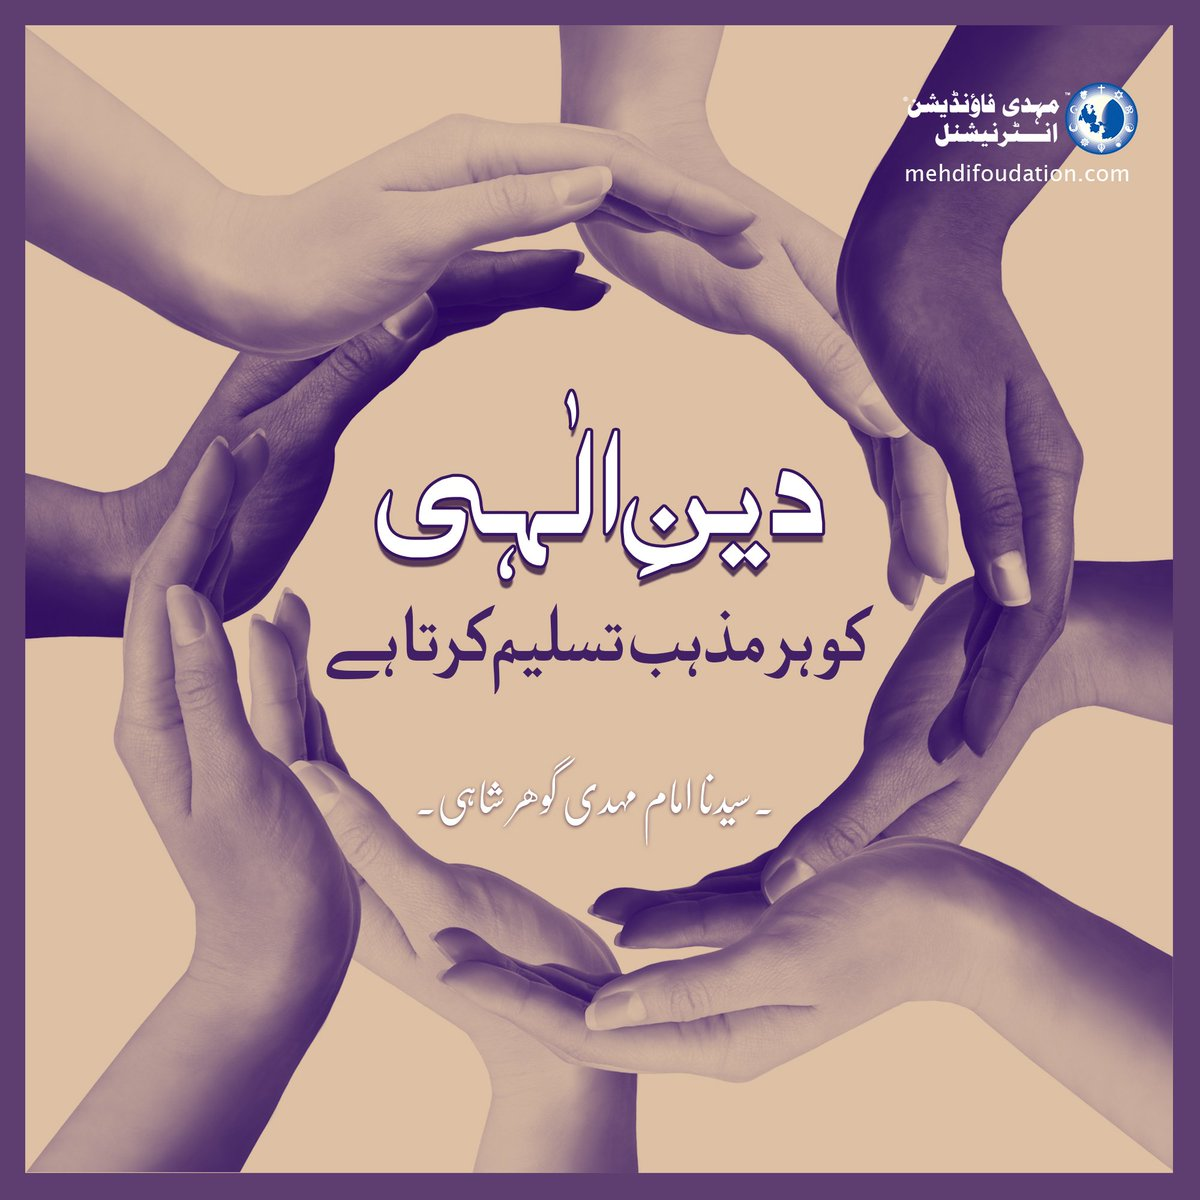 #QuoteoftheDay دینِ الٰہی کو ہر مذہب تسلیم کرتا ہے۔ سیدنا امام مہدی گوھر شاہی Add HH Younus AlGohar on Snapchat: @repimgs snapchat.com/add/repimgs #SufiOnline #AlRATV @younusalgohar #Sufism #Spirituality #Religion #God #Divine #Interfaith #Faith #Urdu #English #Ramazan #Allah